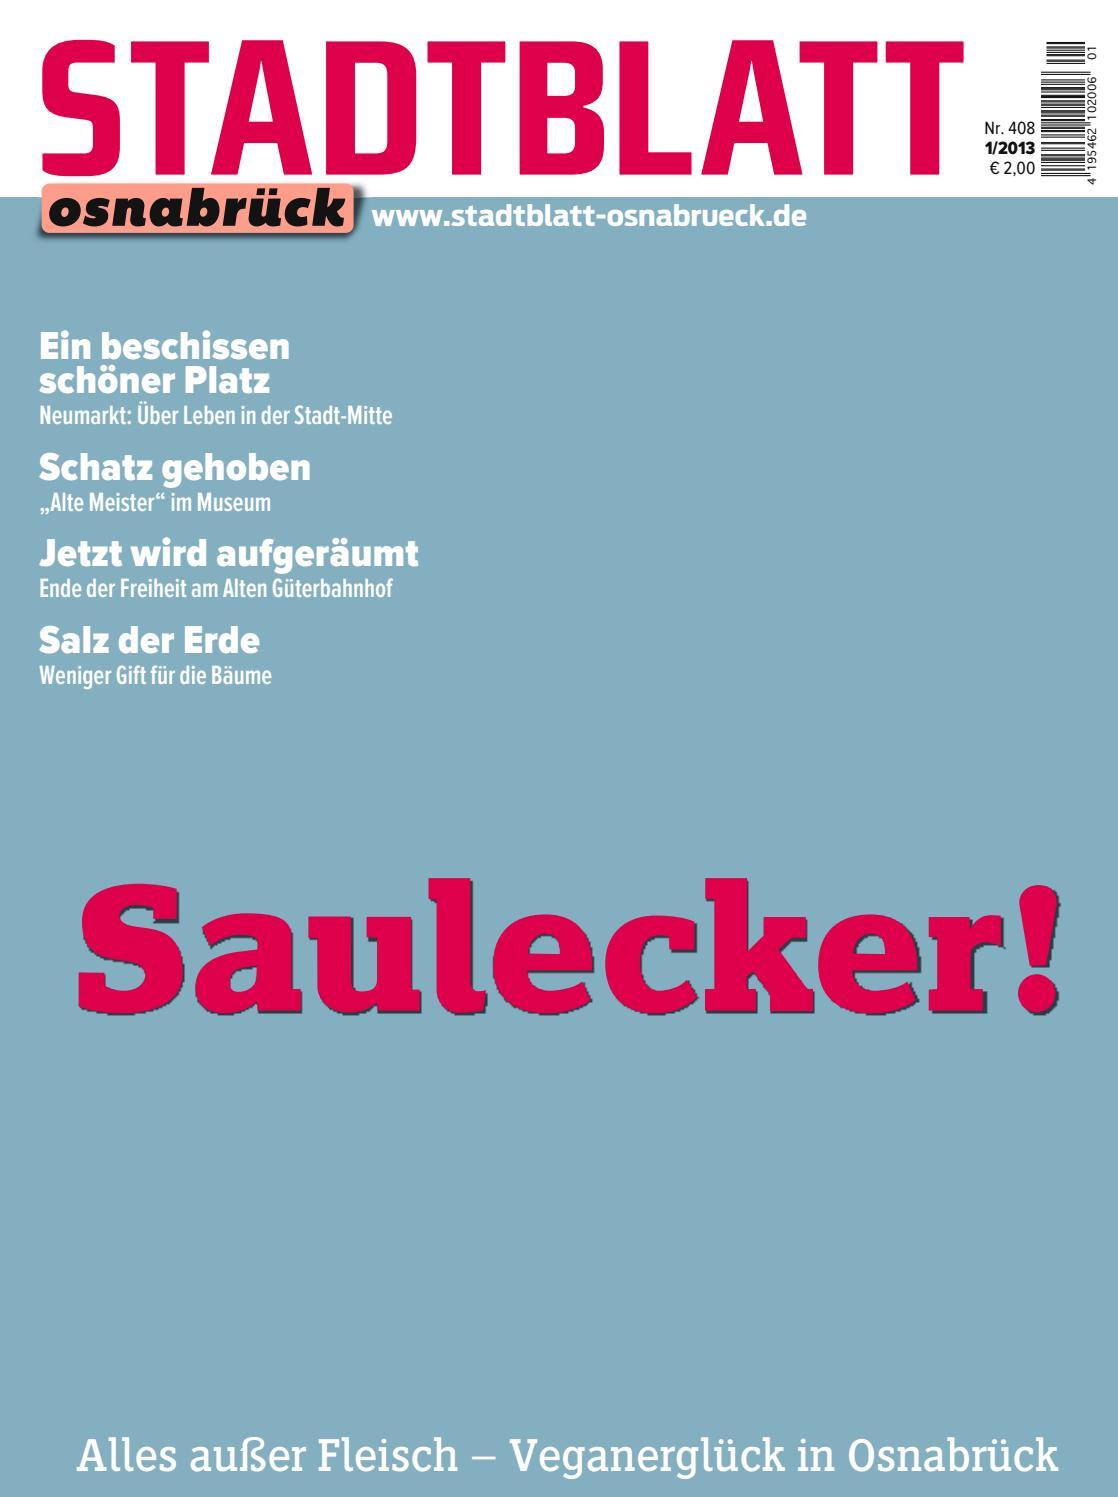 Stadtblatt 2013.01 By Bvw Werbeagentur - Issuu pour Police Script Ecole